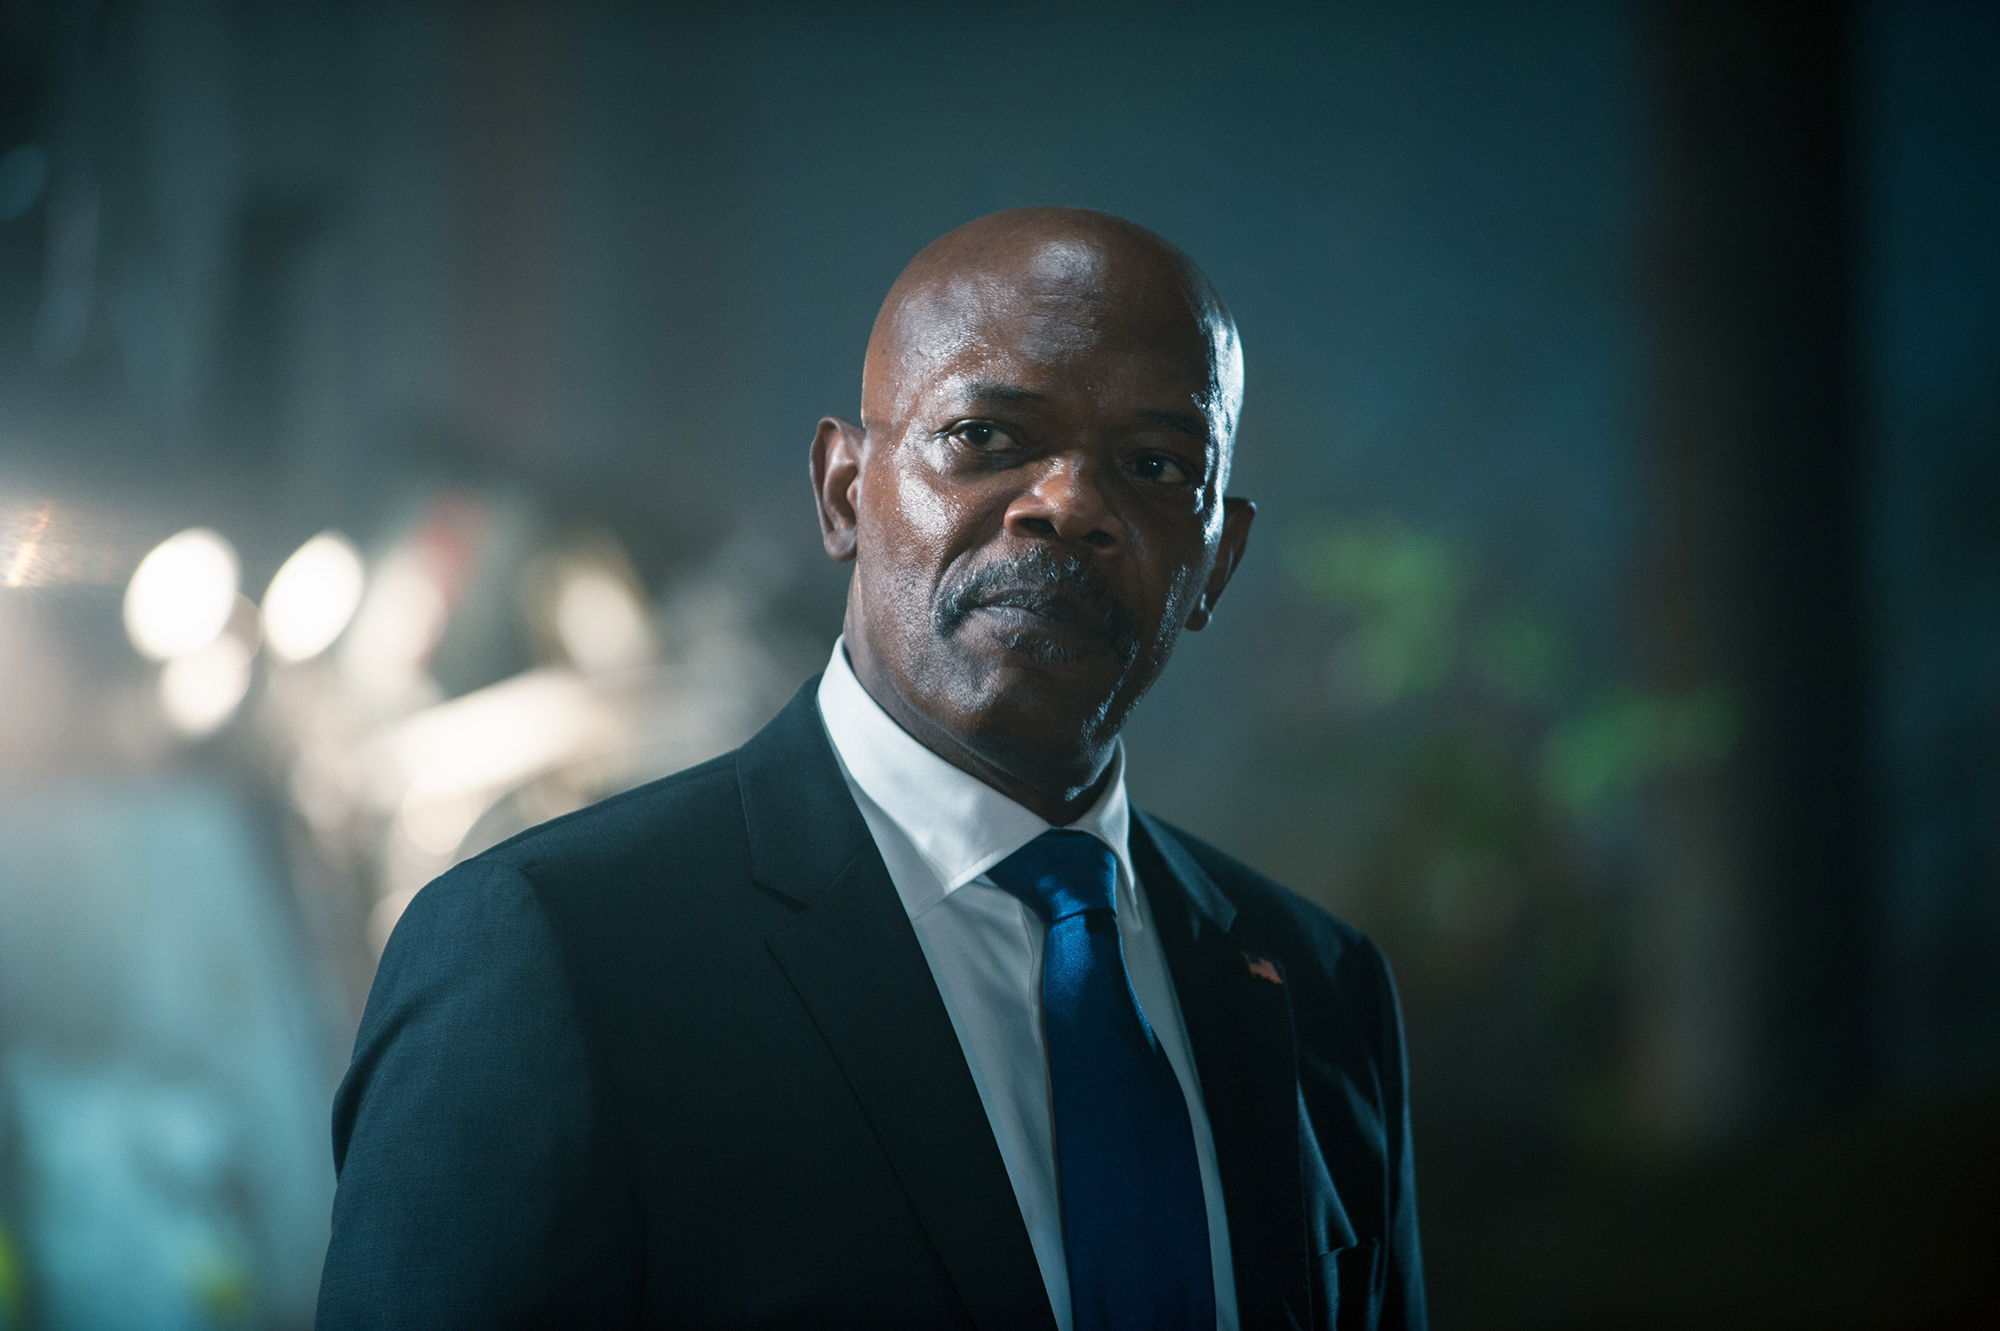 Samuel L. Jackson as William Alan Moore in Big Game, 2014.